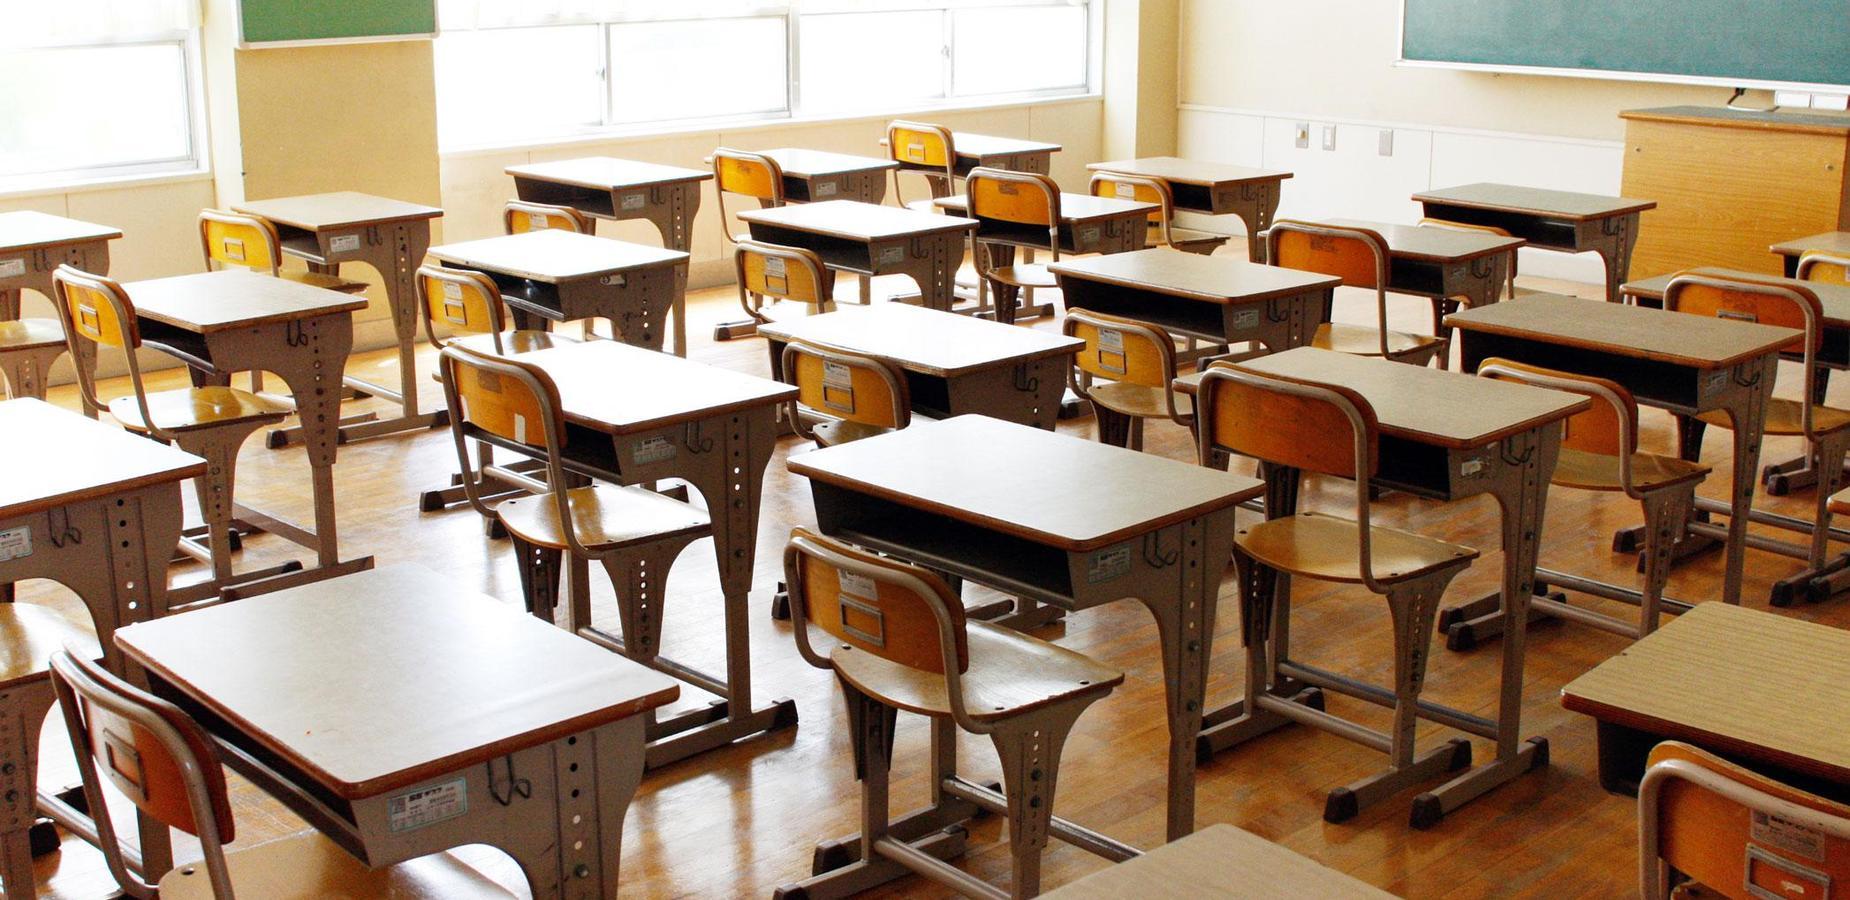 Student desks organized in rows.